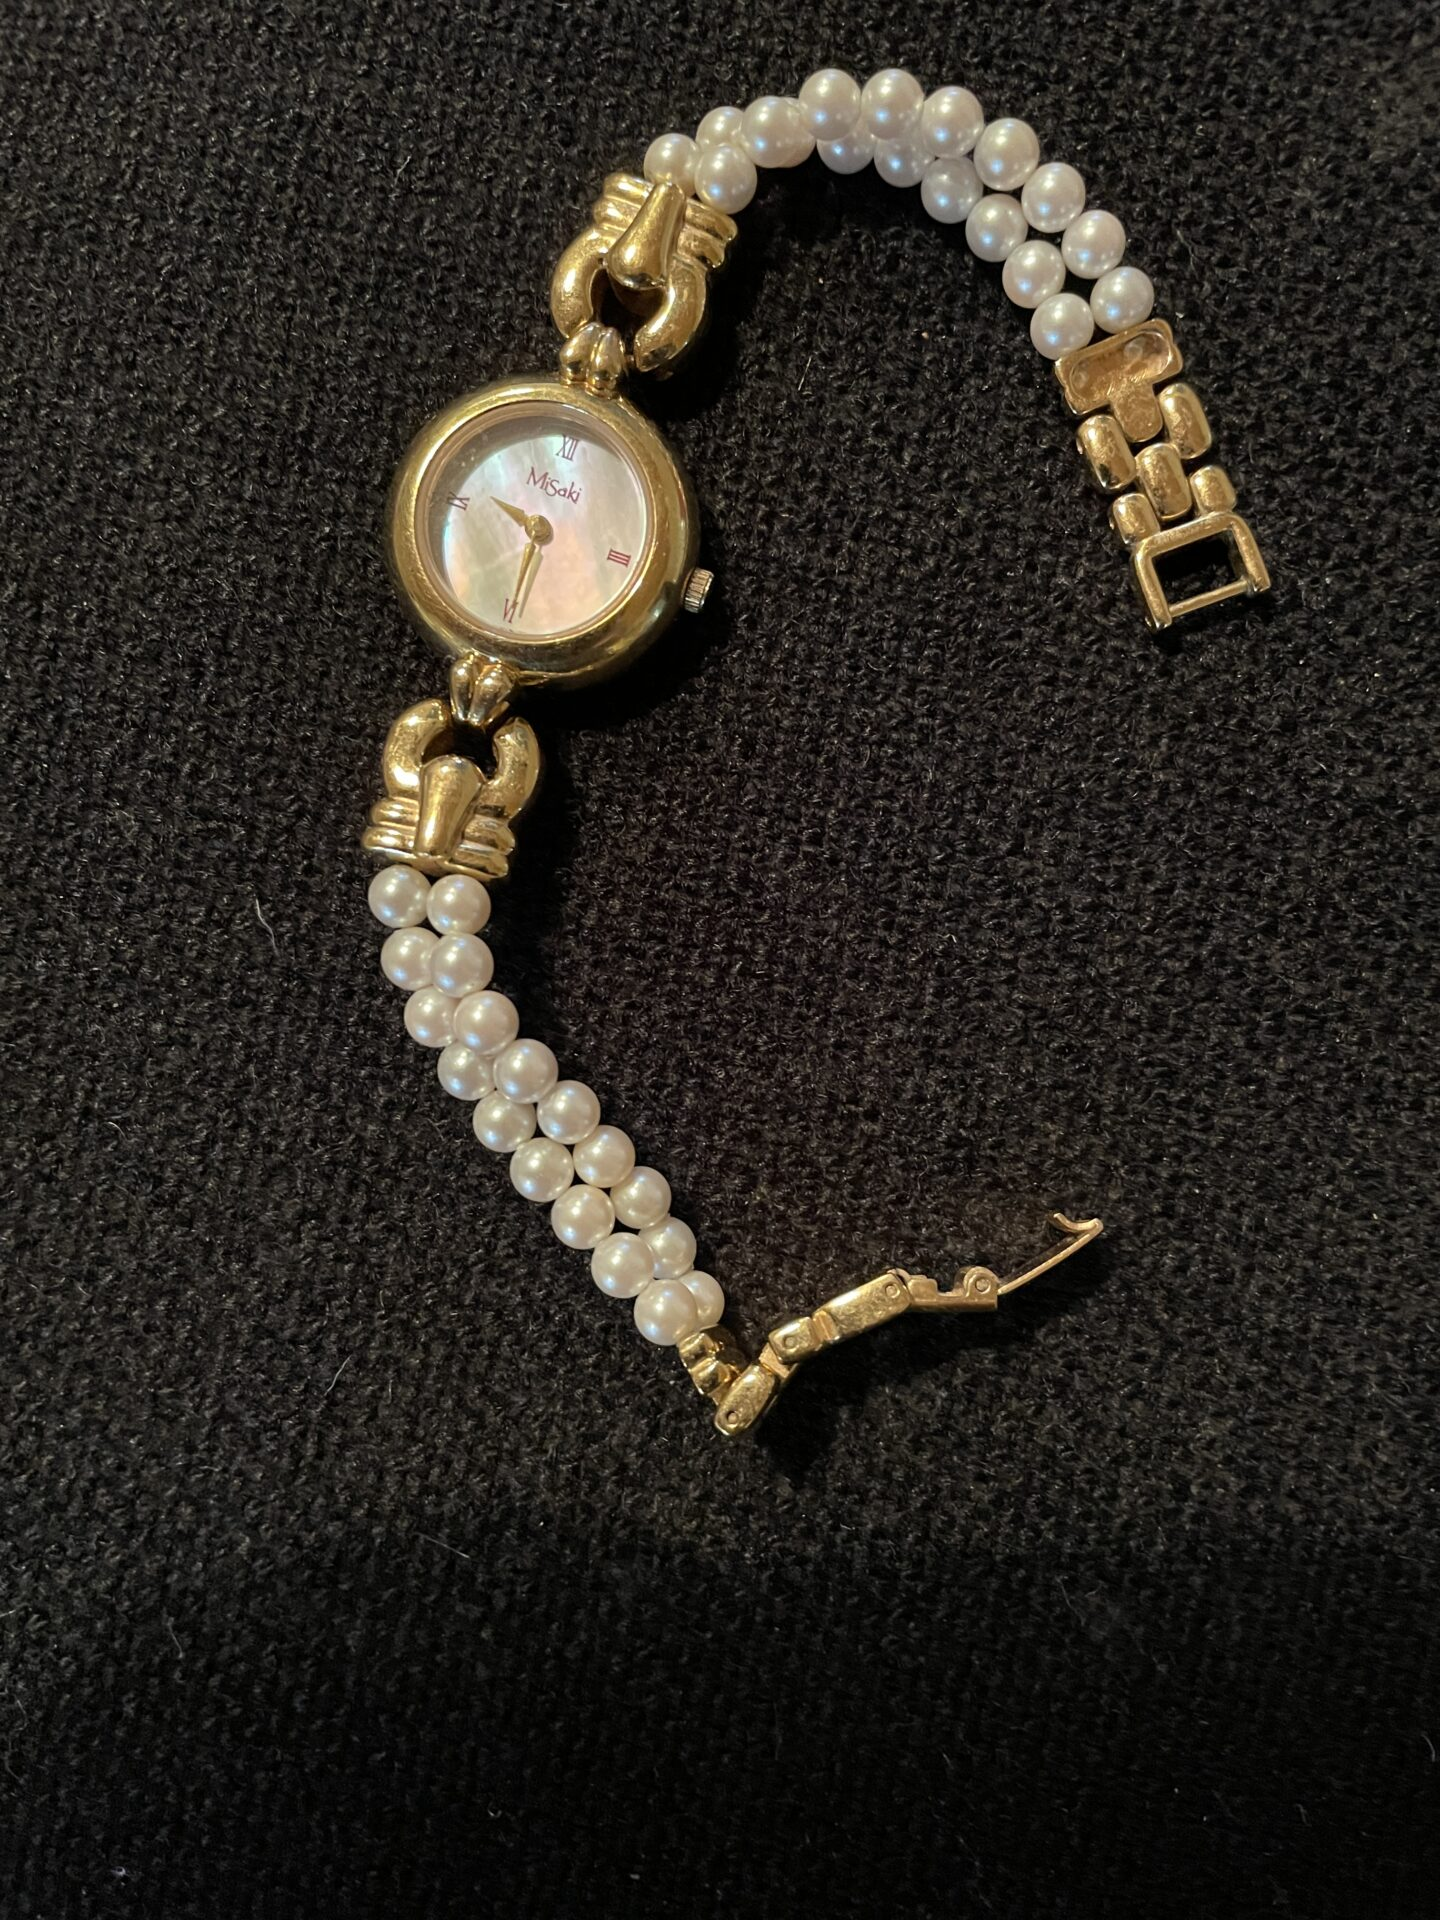 Mi Saki damearmbåndsur, pris 500kr